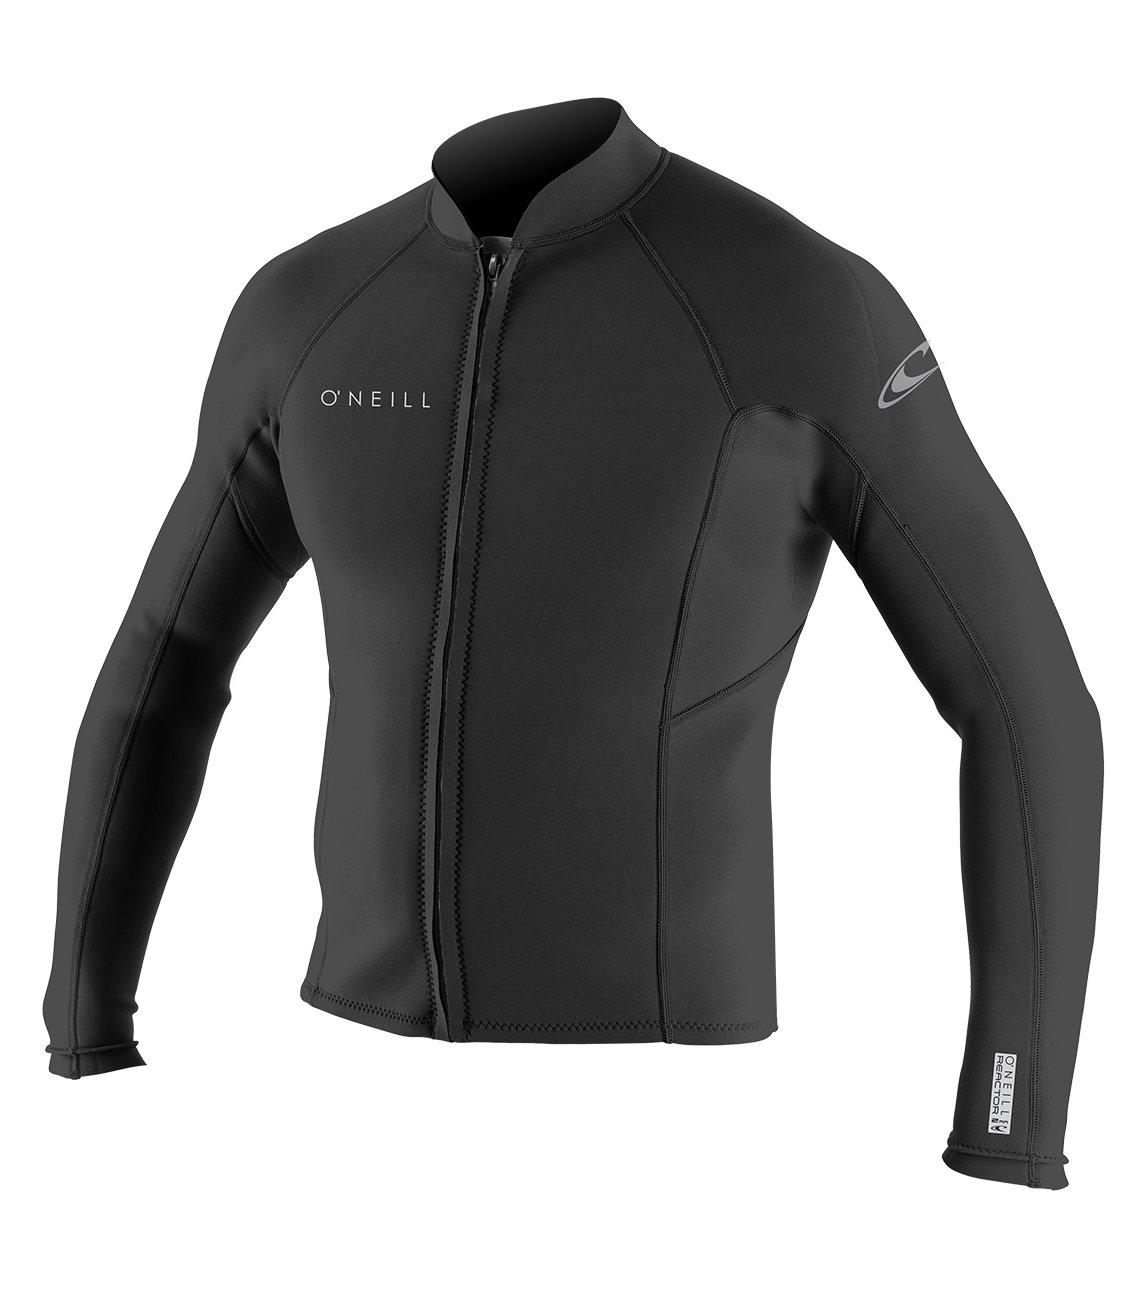 O'Neill Men's Reactor-2 2mm Front Zip Long Sleeve Jacket, Black, Small